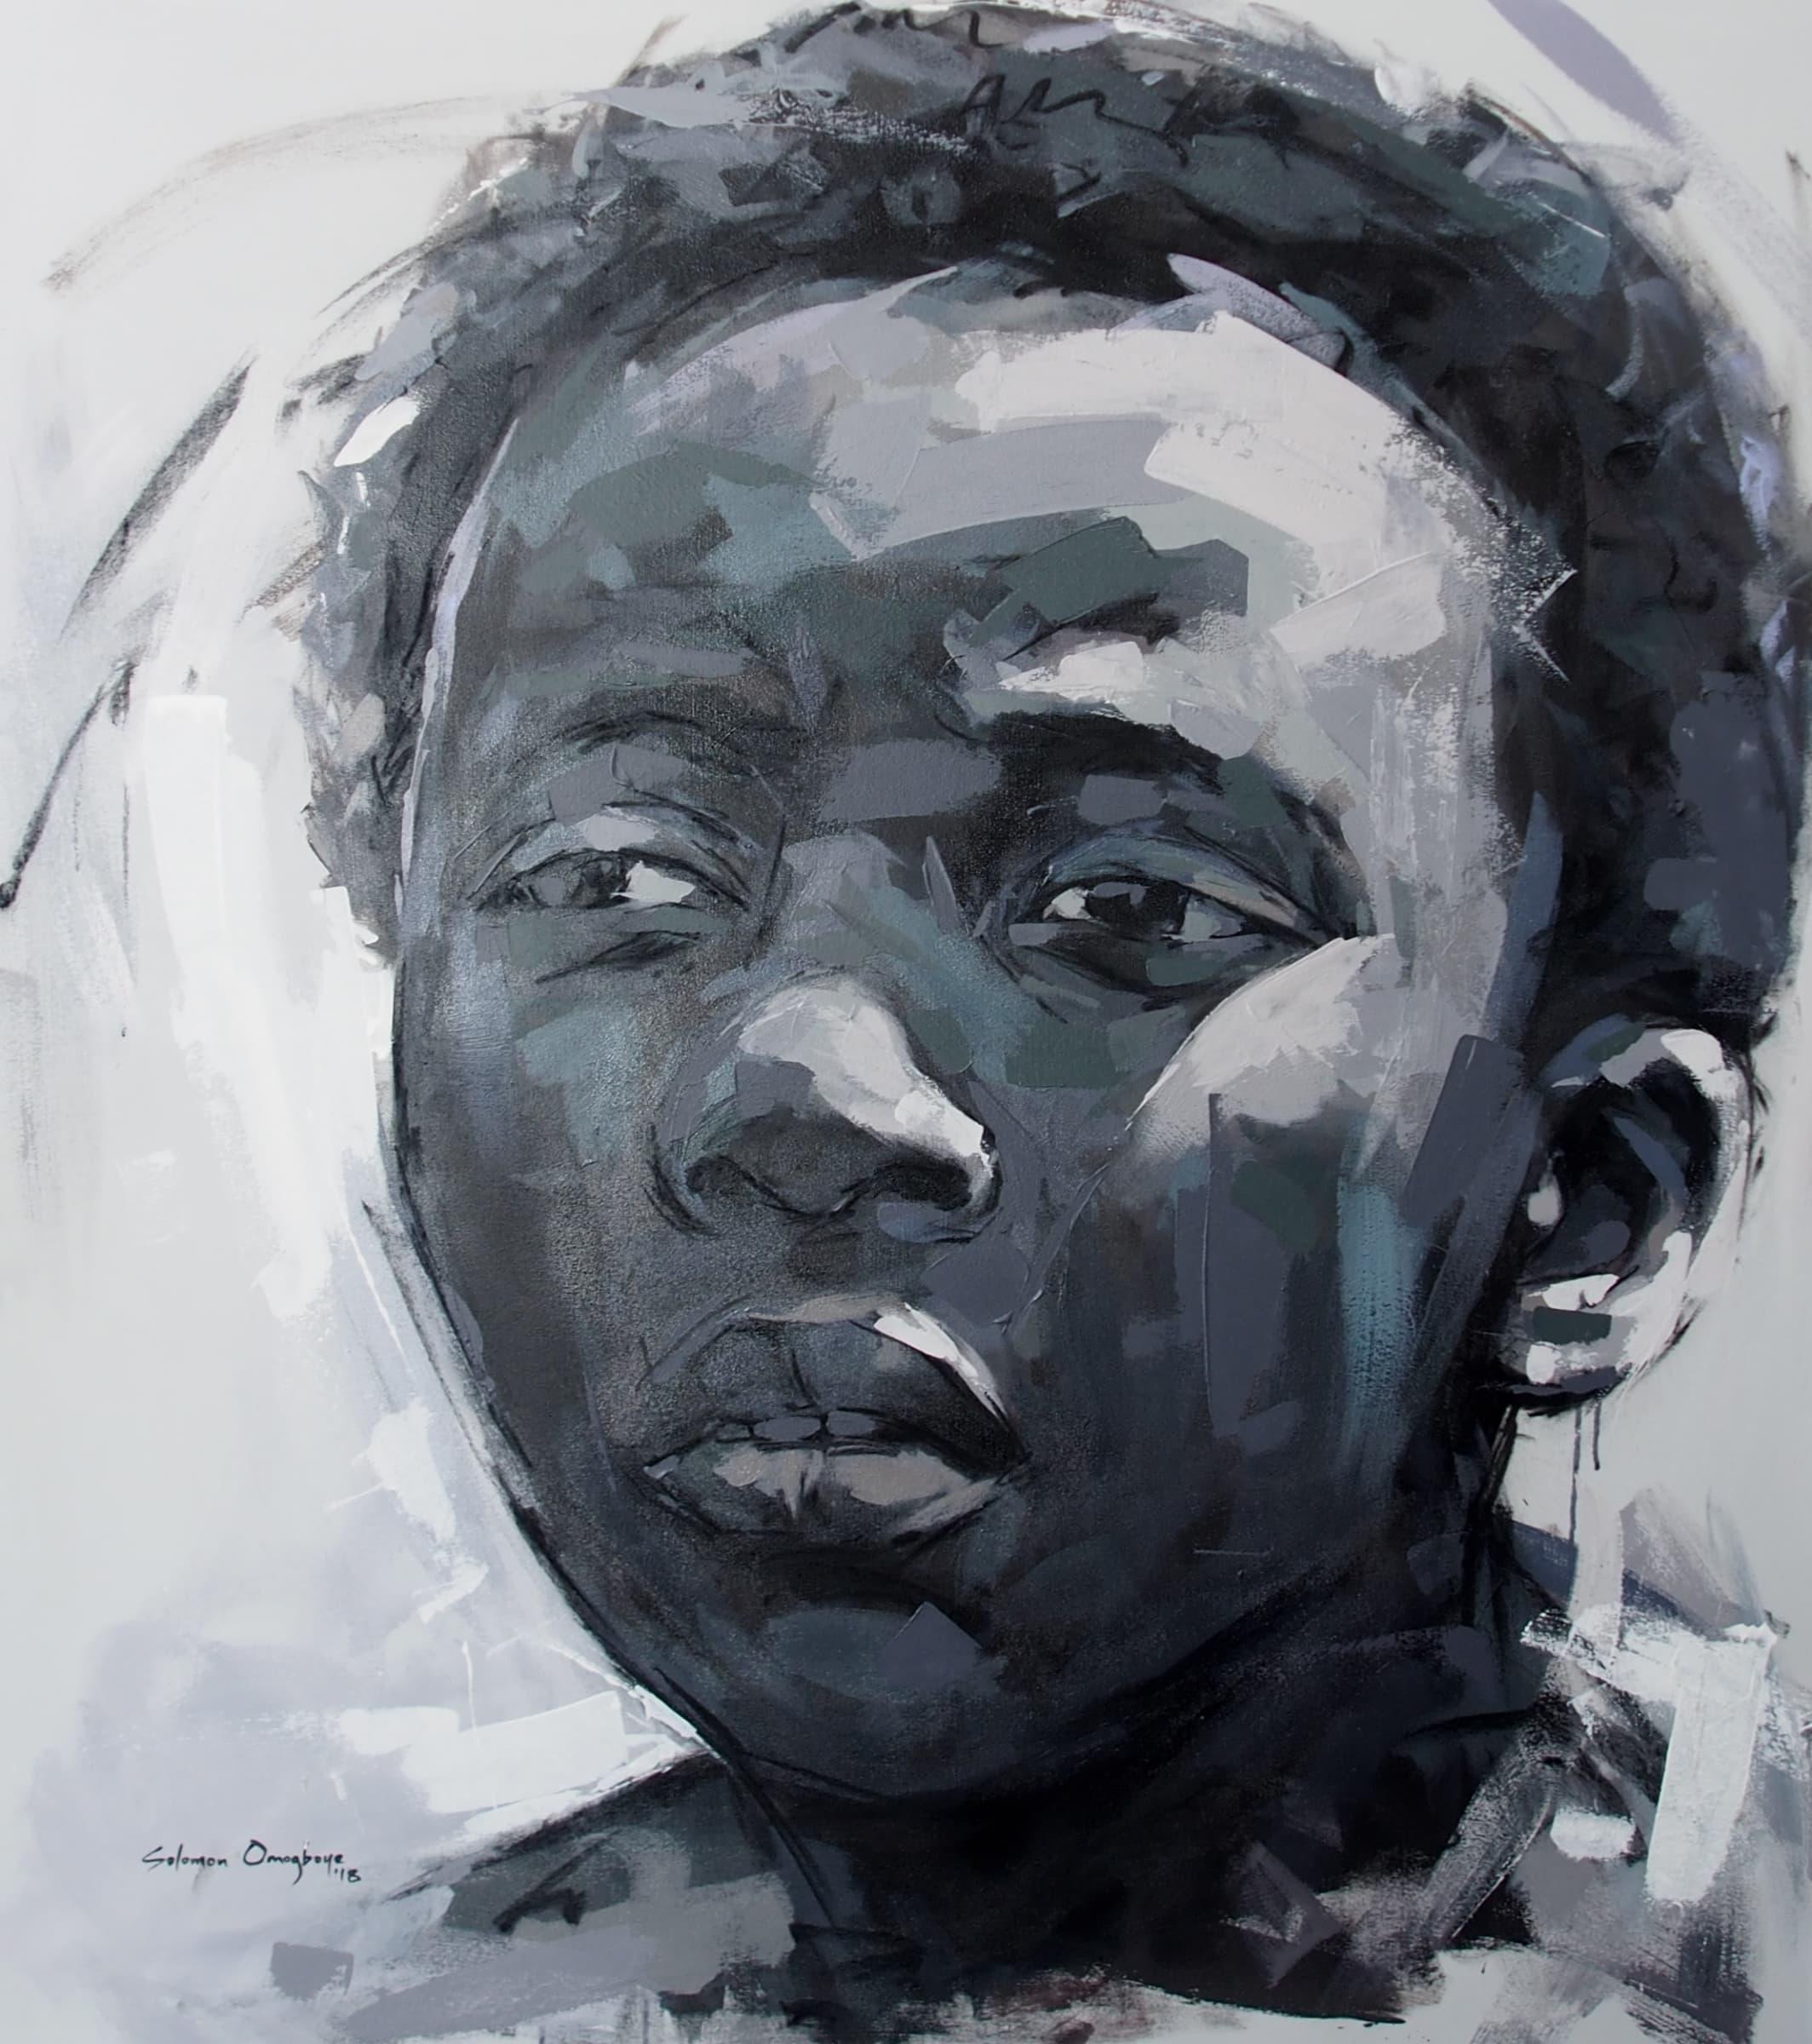 <span class=&#34;link fancybox-details-link&#34;><a href=&#34;/artworks/categories/121/2005-solomon-omogboye-beyond-the-gaze-2018/&#34;>View Detail Page</a></span><div class=&#34;artist&#34;><strong>Solomon Omogboye</strong></div> <div class=&#34;title&#34;><em>Beyond The Gaze</em>, 2018</div> <div class=&#34;medium&#34;>Acrylic On Canvas</div> <div class=&#34;dimensions&#34;>132cm x 143.7cm (153cm x 164.8cm framed)</div><div class=&#34;price&#34;>R38,000.00</div>